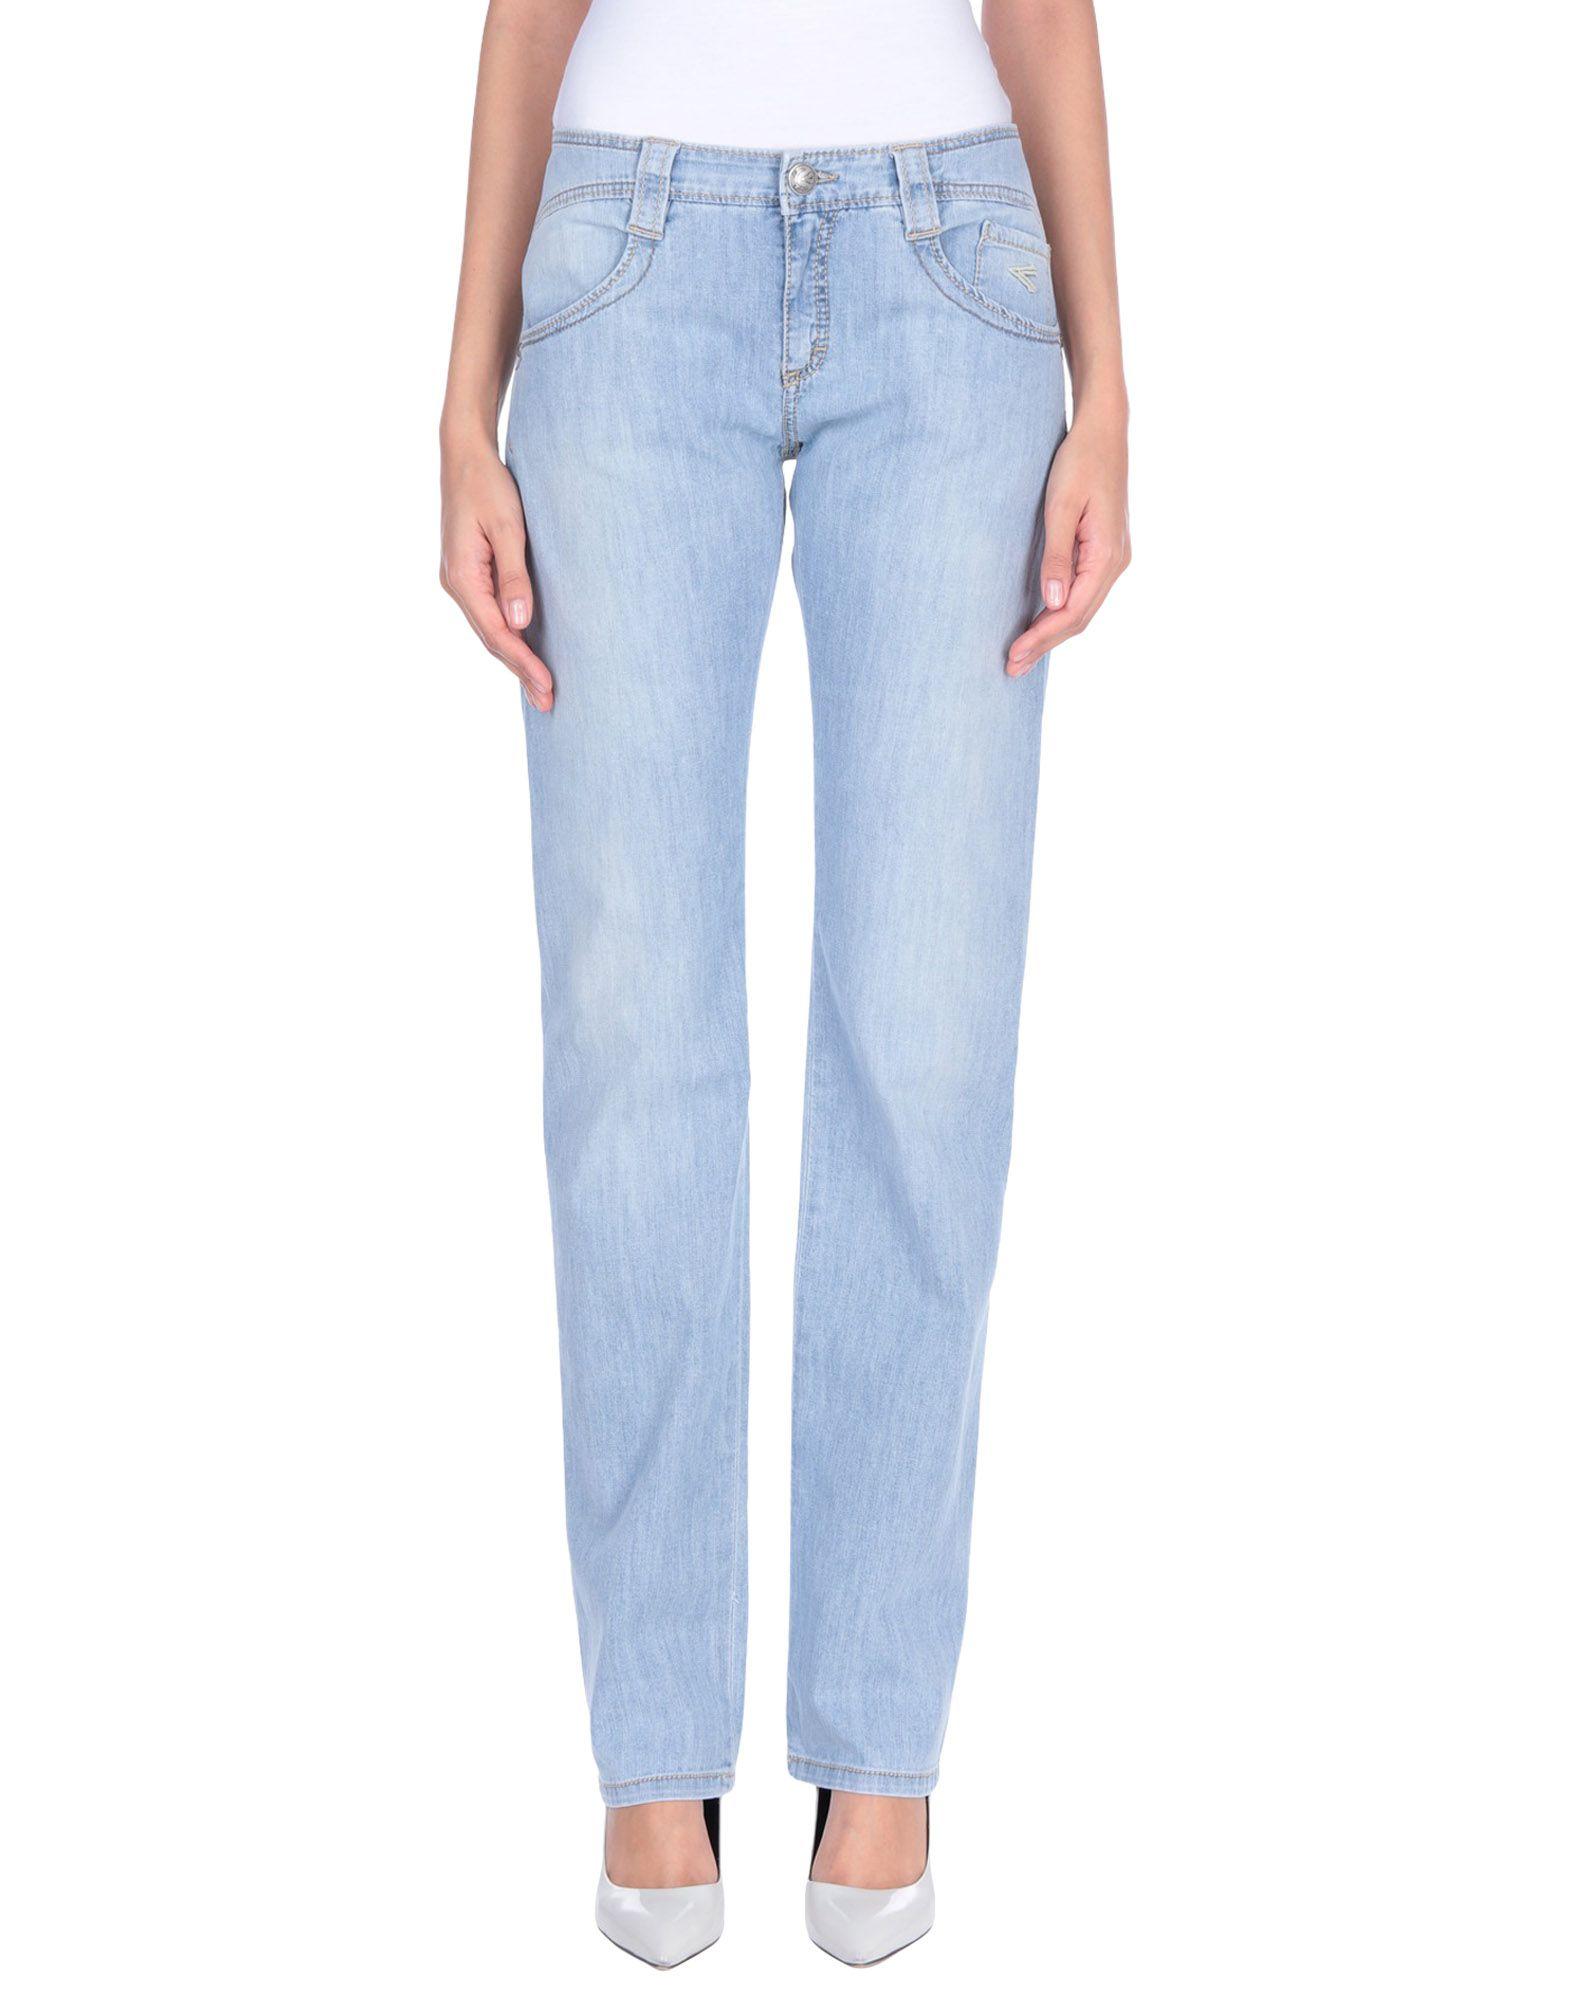 Pantaloni Jeans Carlo  onna donna - 42720721UT 42720721UT 42720721UT 392